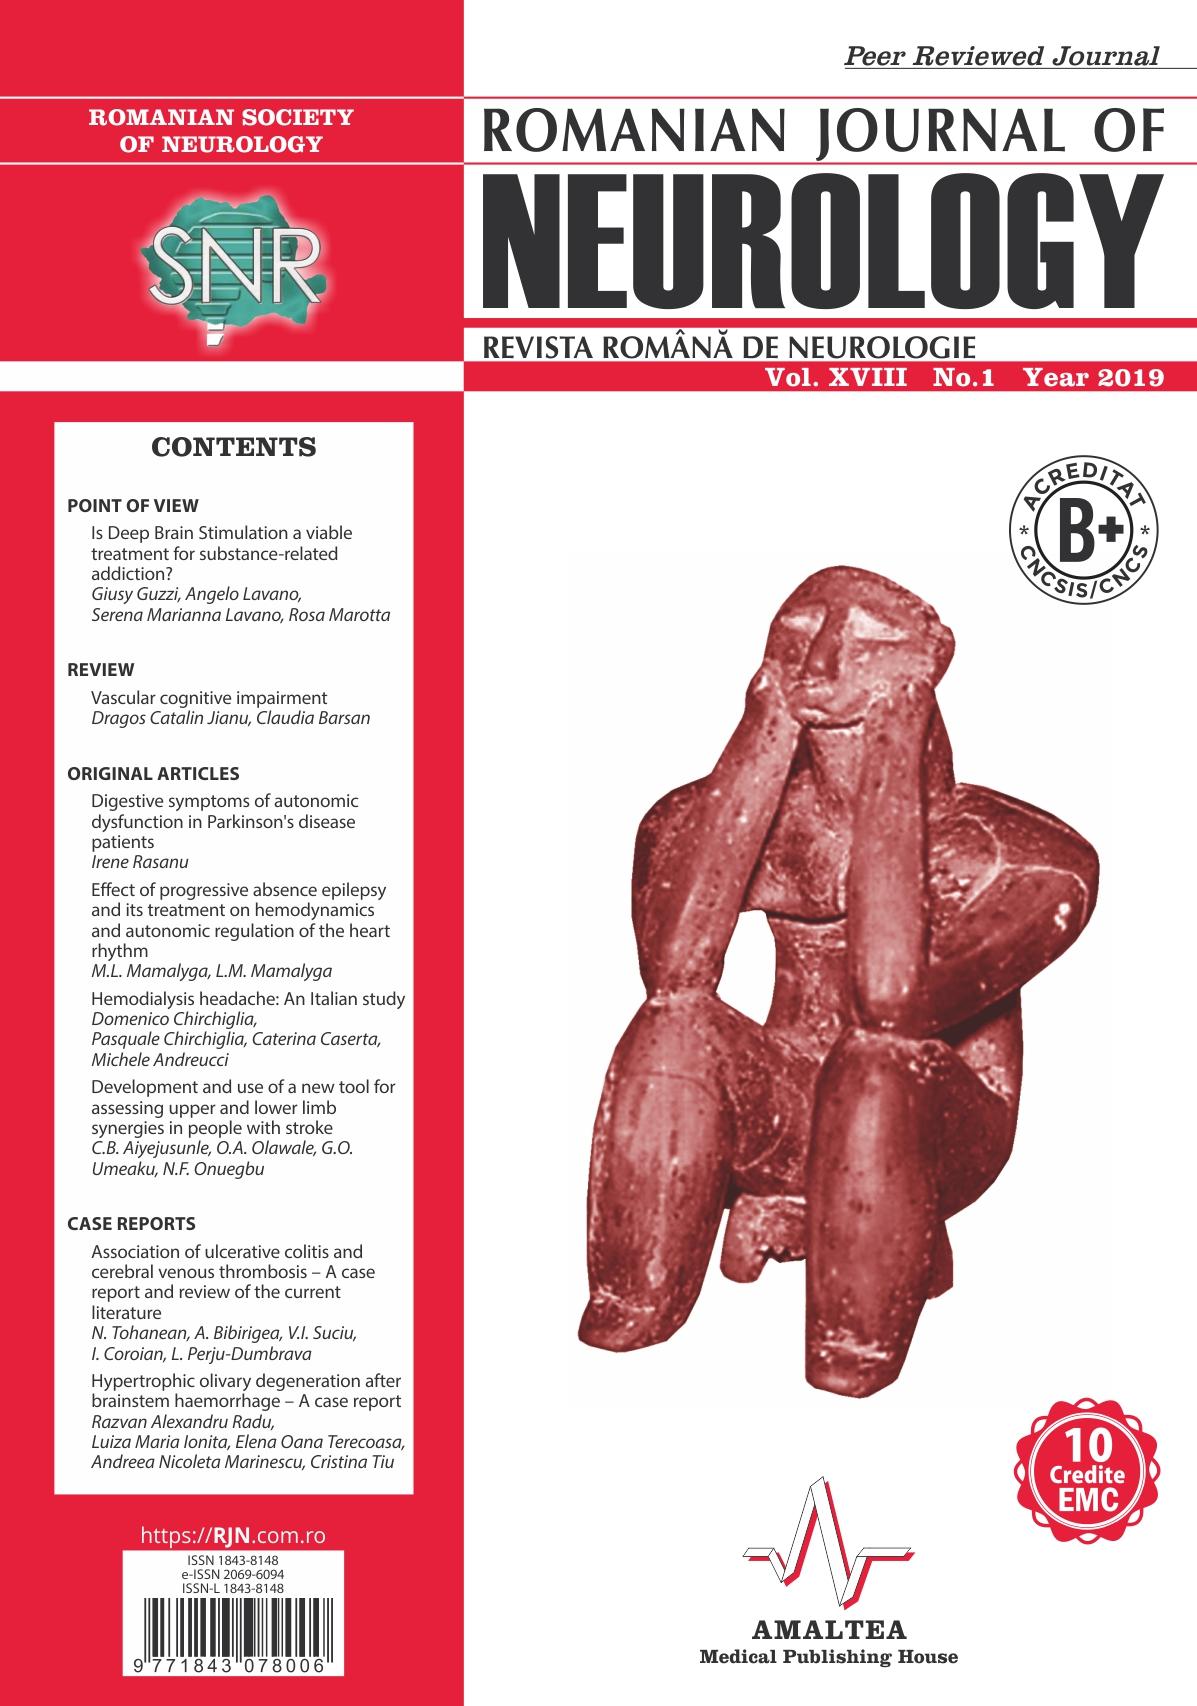 Romanian Journal of Neurology, Volume XVIII, No. 1, 2019